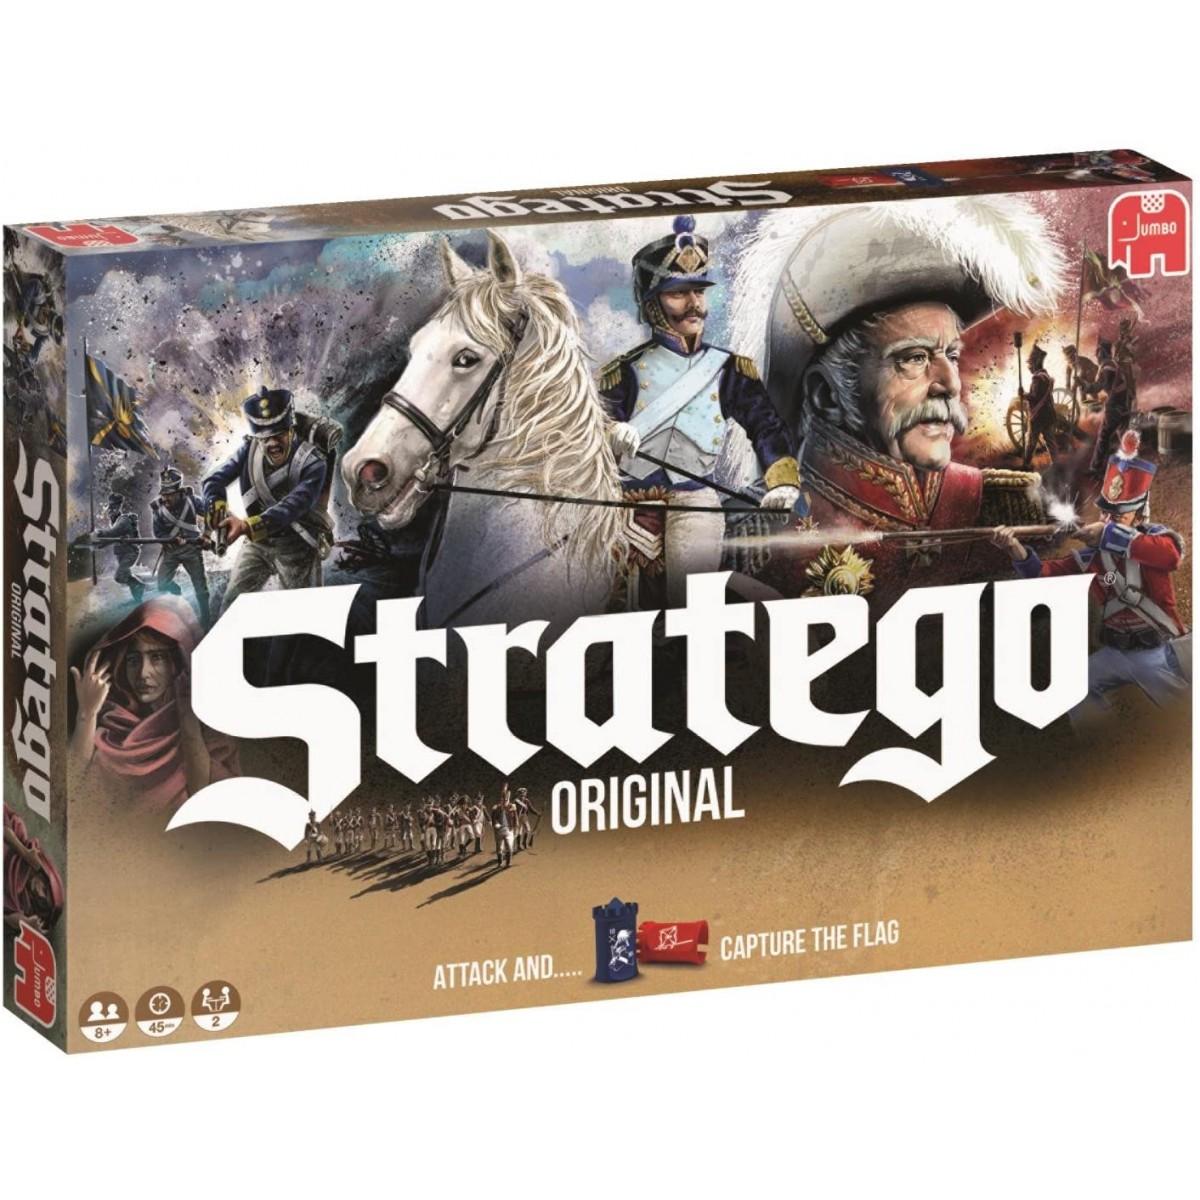 Gioco da Tavolo Stratego Original - Jumbo